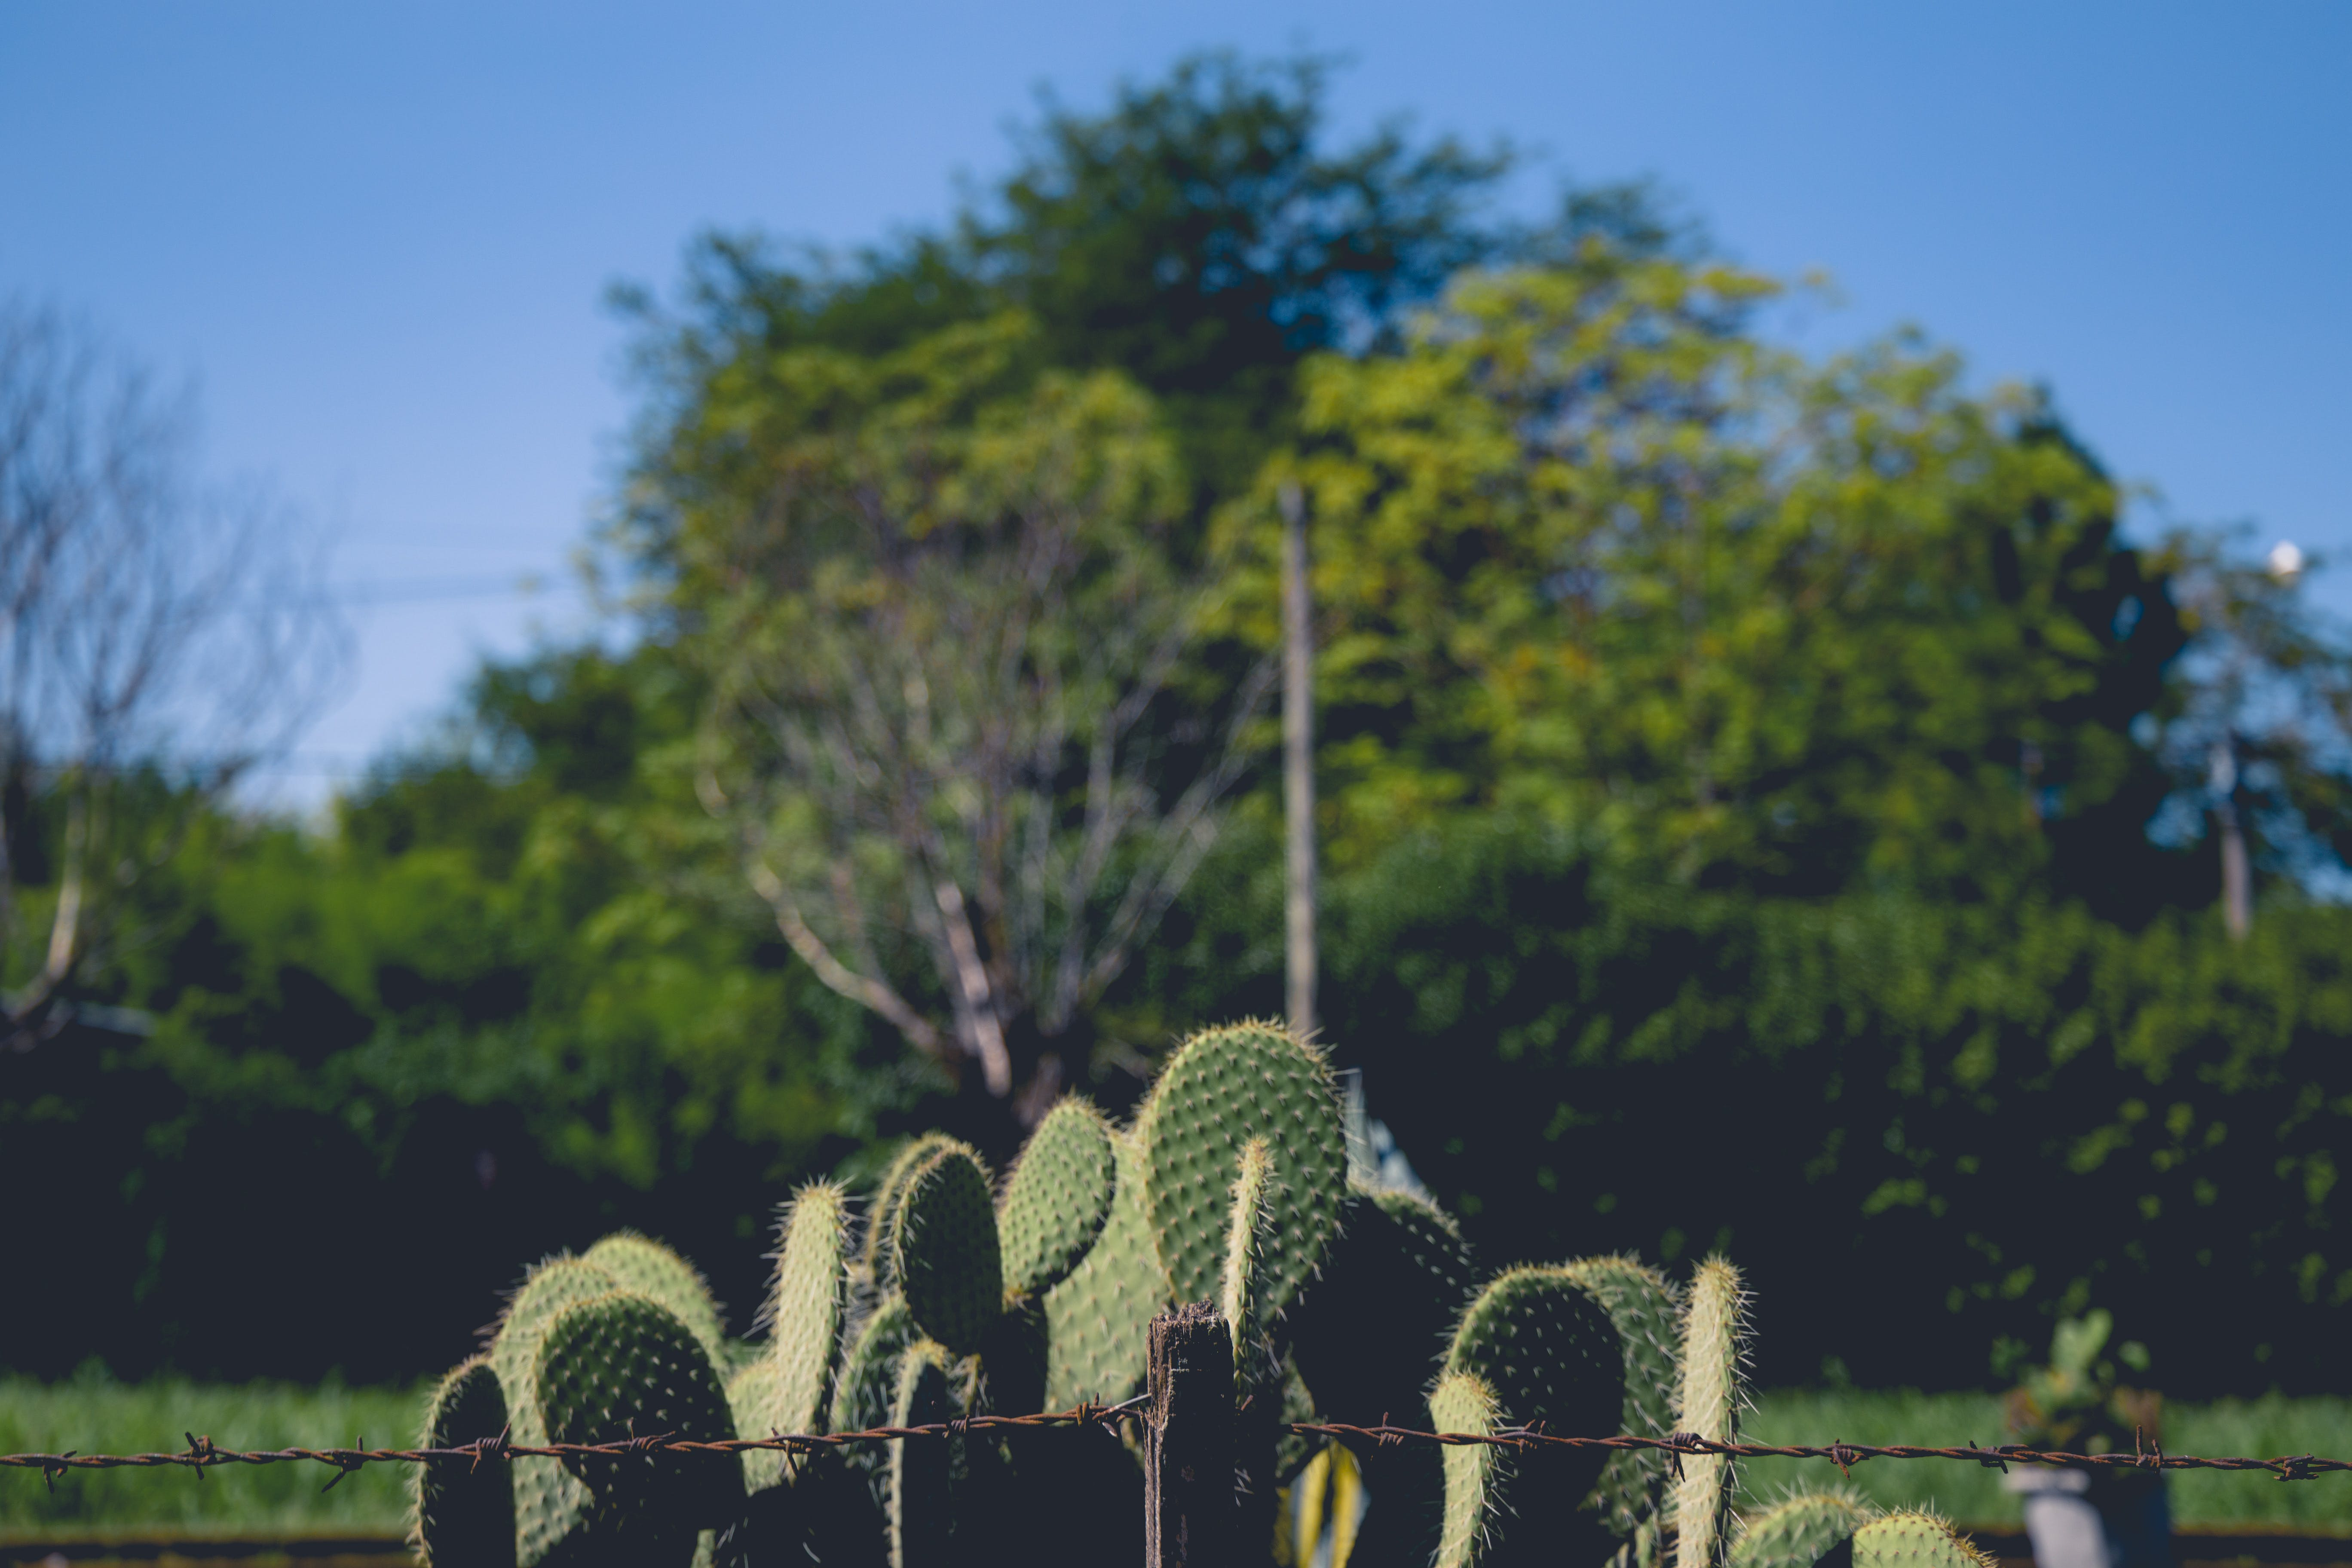 Free stock photo of cactus, cactus garden, cactus plant, green